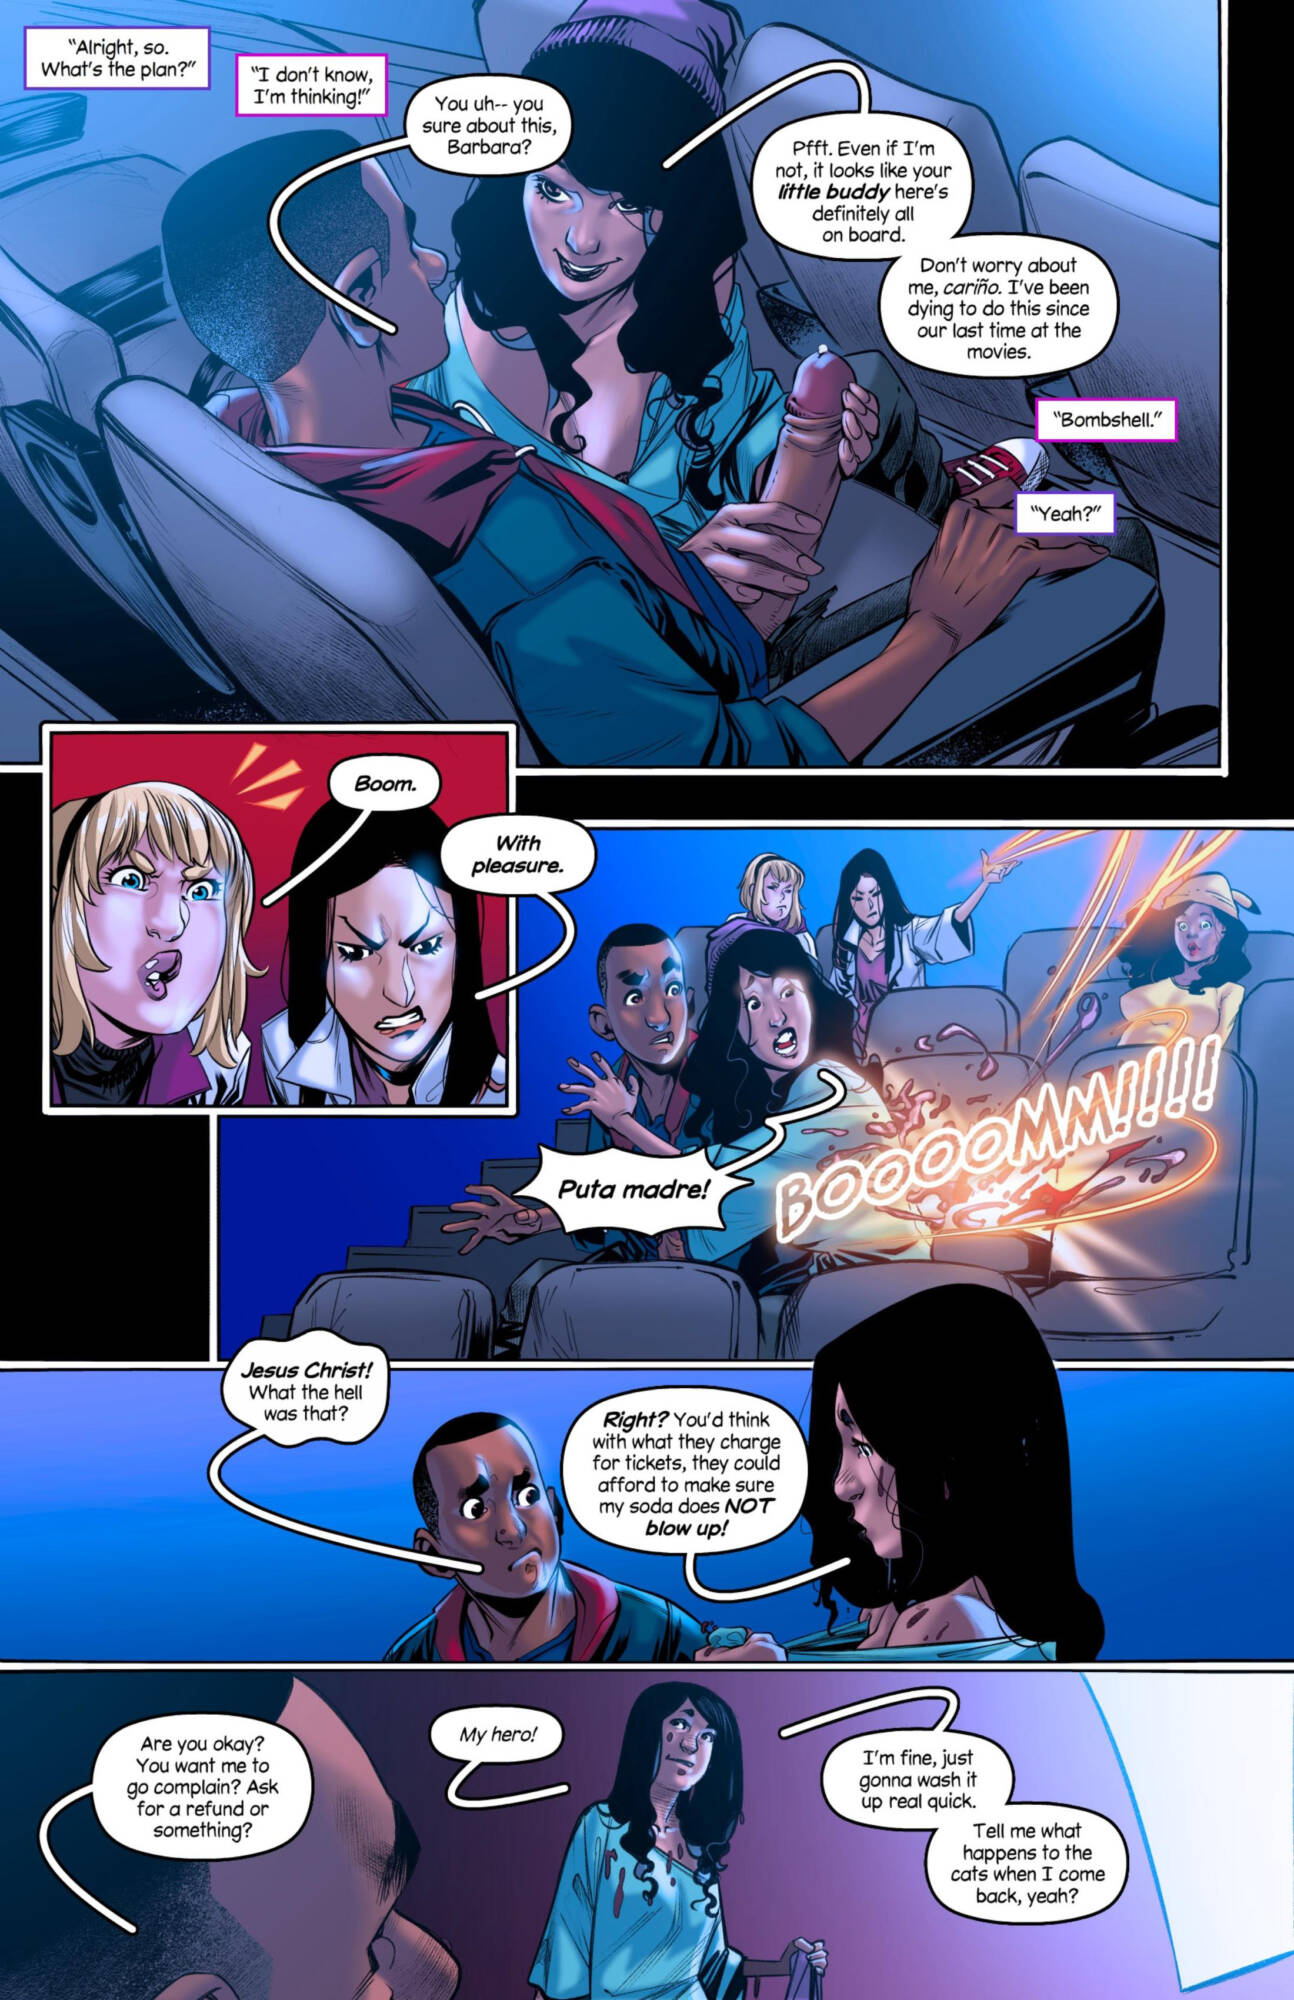 Weaving Fluids #4 (English) - page02 Marvel Universe,Spider-Man,  xxx porn rule34